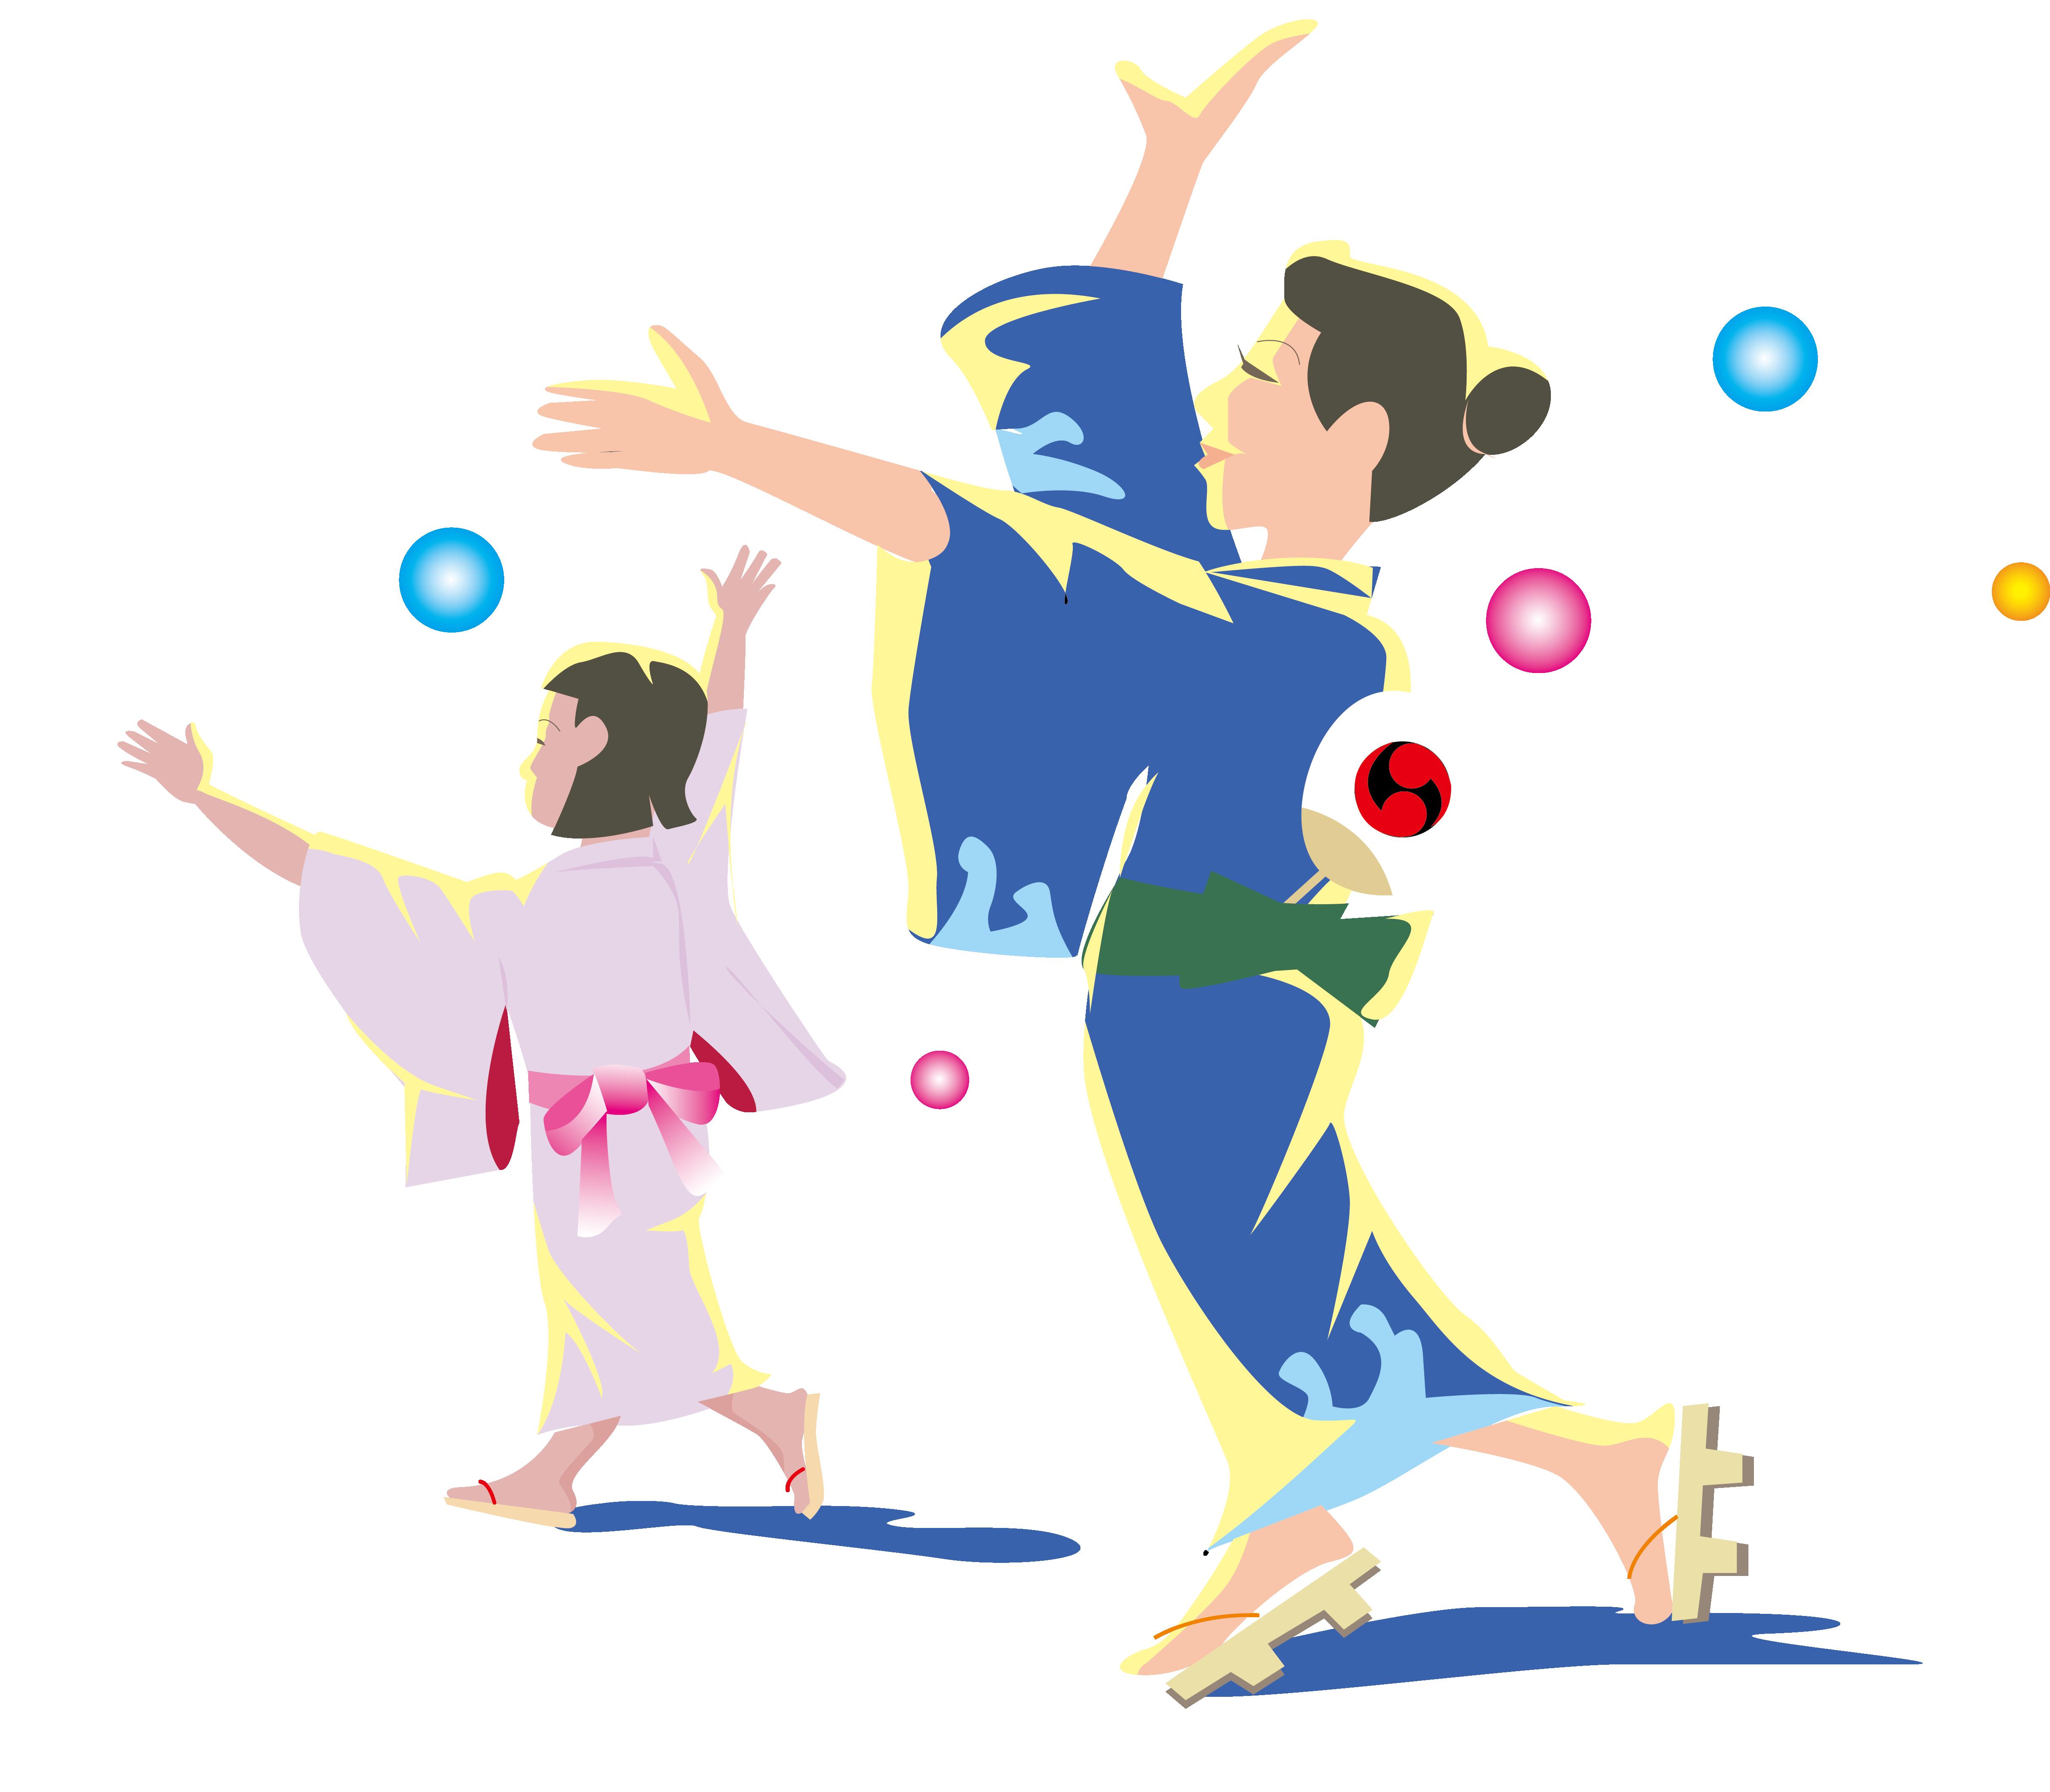 Dancing hot dog clipart svg black and white stock Japan Dance Clip art - Japanese kimono dancing mother and daughter ... svg black and white stock